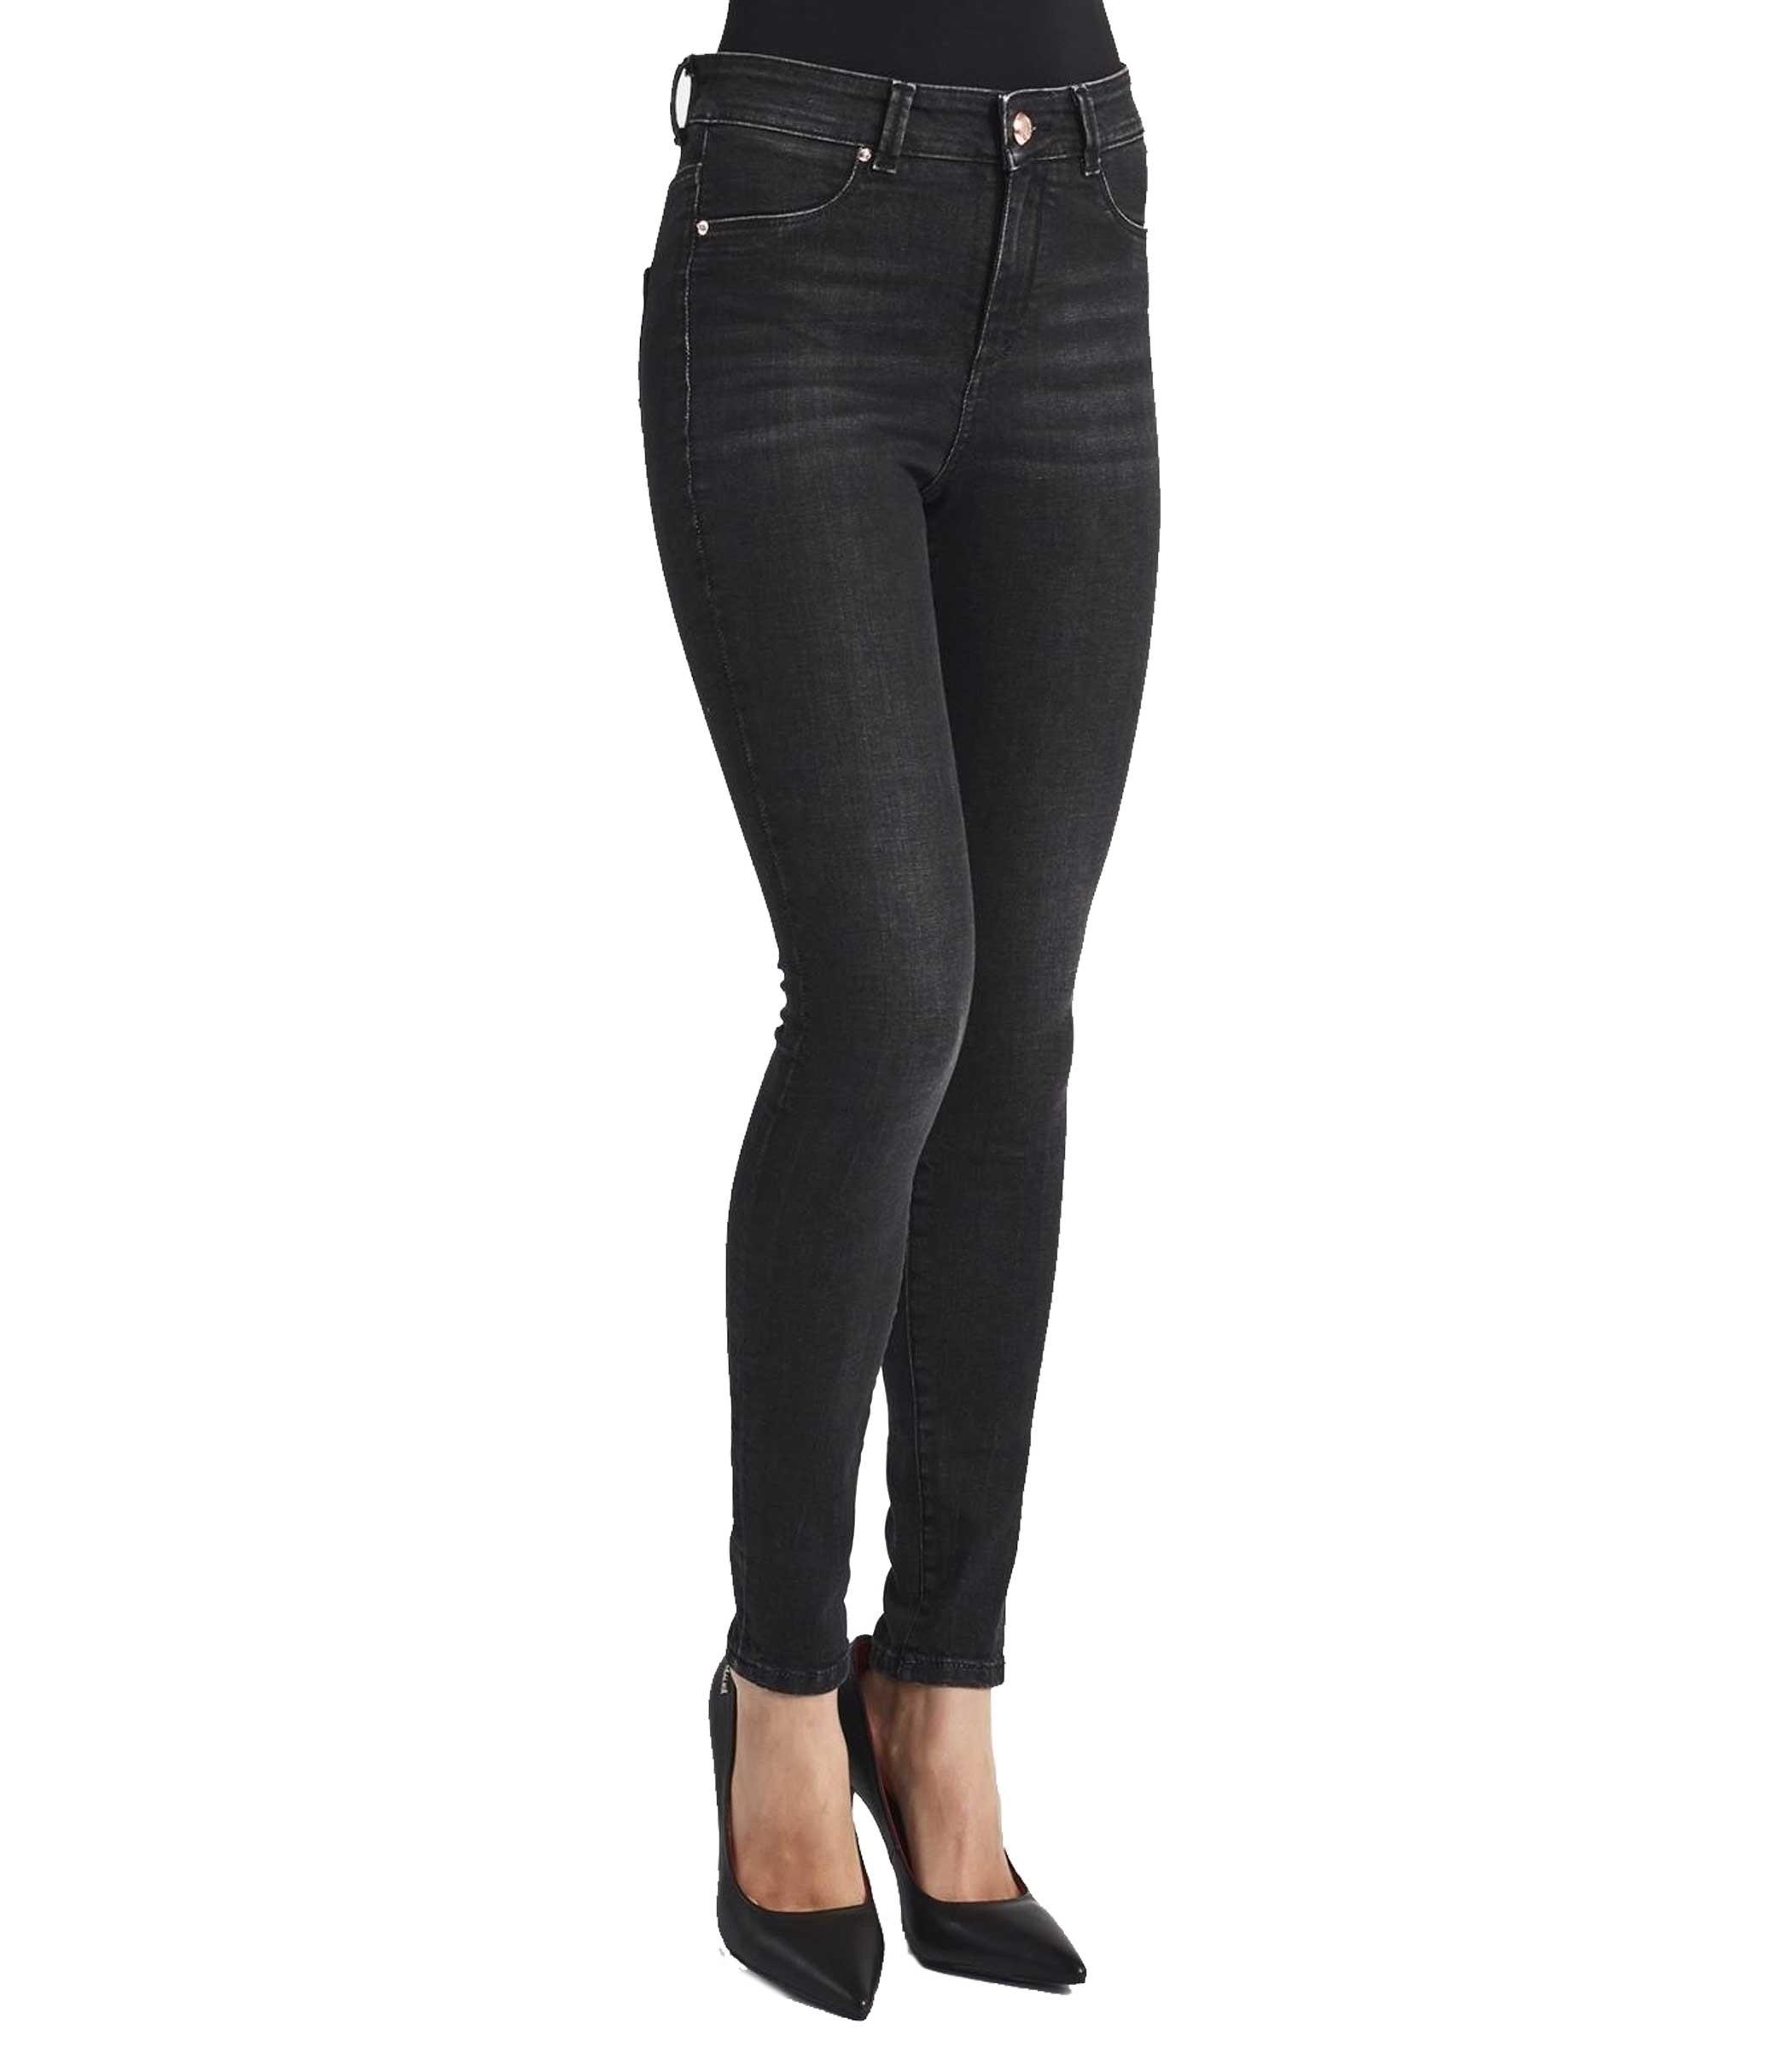 Da Donna Tasche Rif821bd26033 5 Jeggings Gaudᄄᆲ Jeans PkTwXOZiu